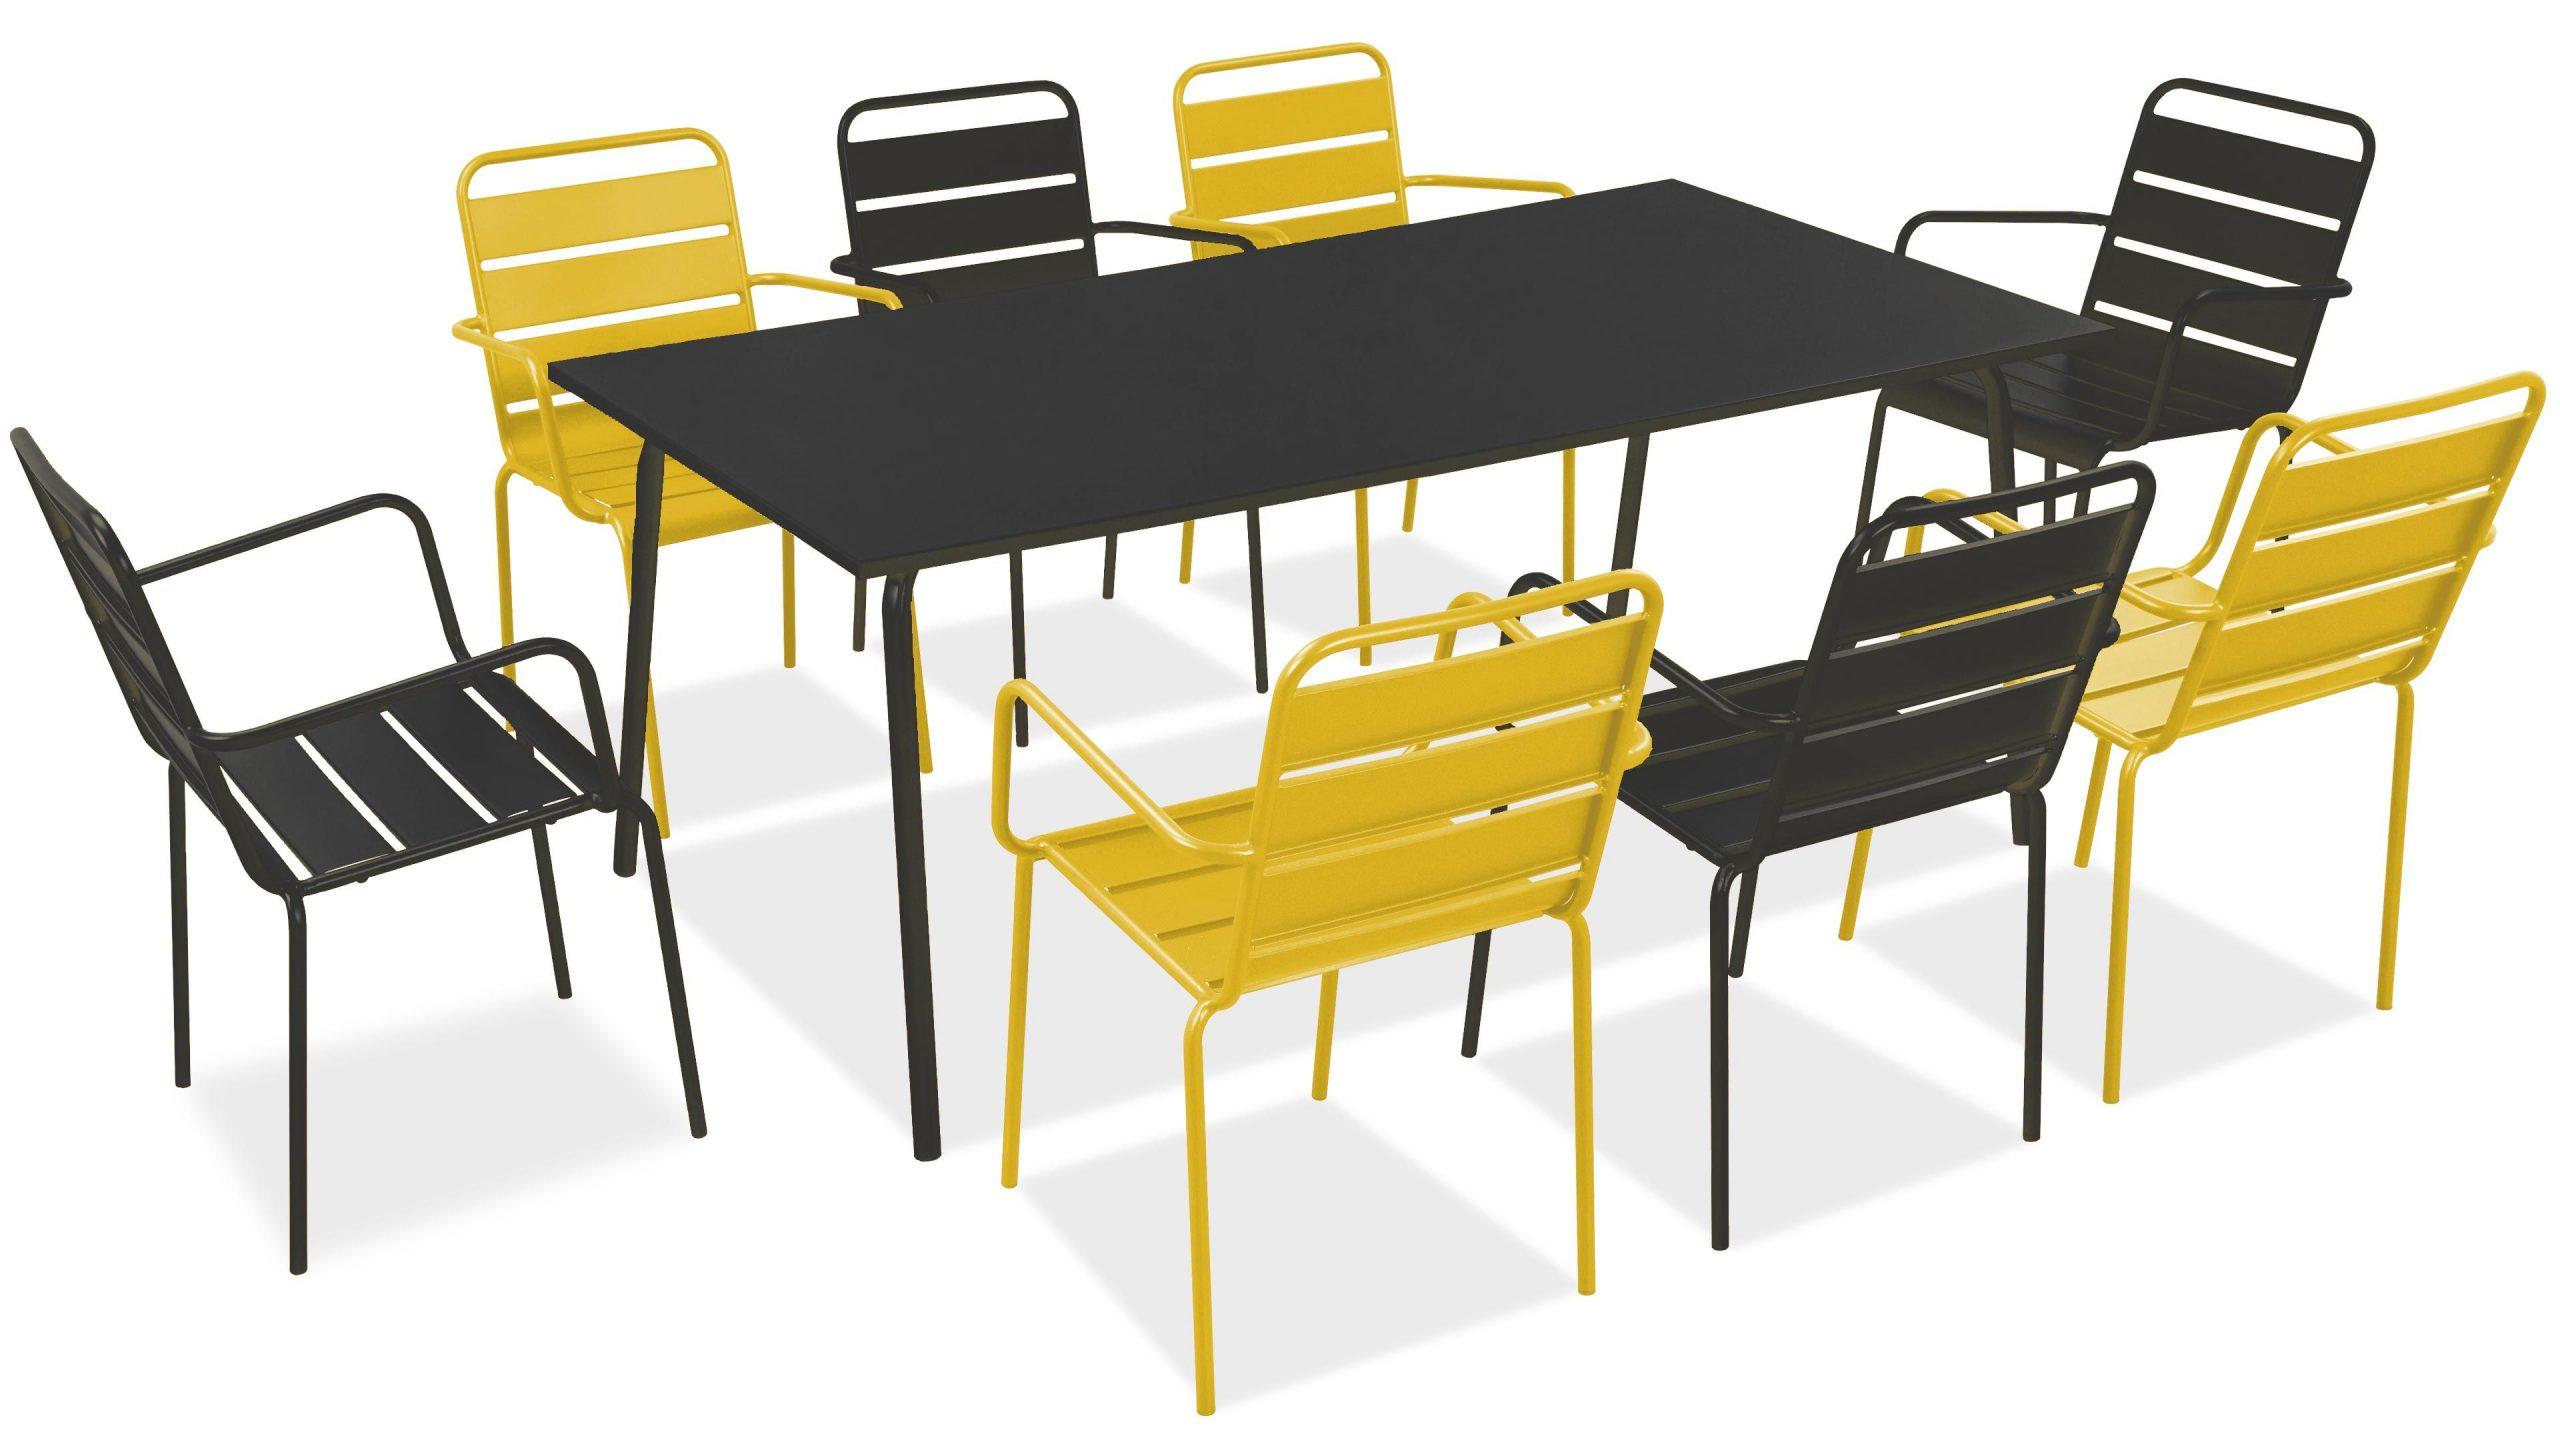 Salon De Jardin Metal Table Et Fauteuils encequiconcerne Table Jardin Verte